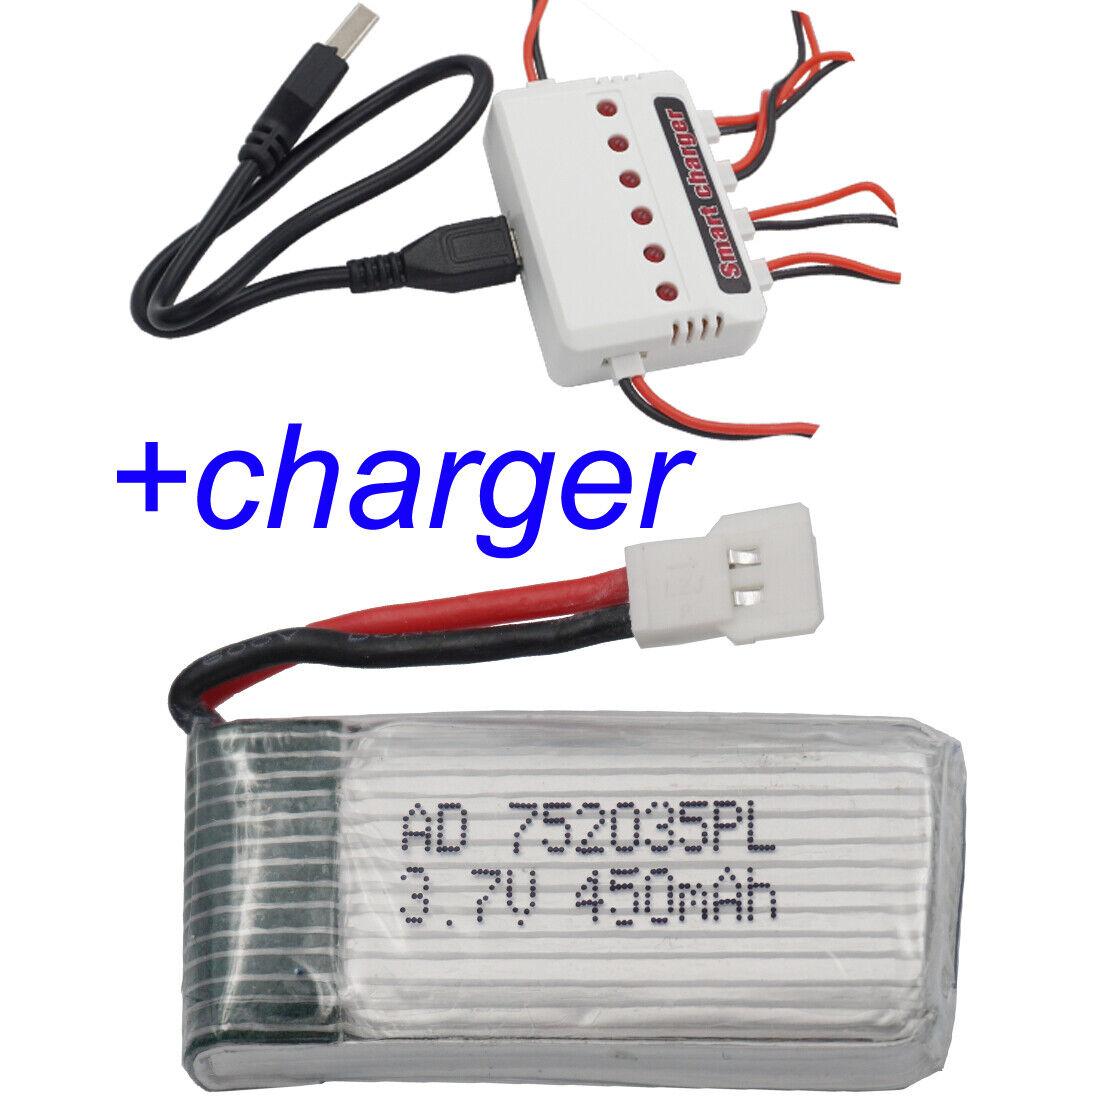 3.7V 450 mAh 25C XH 2.54 Polymer LiPo battery 752035 For SYMA X5C X5SC X5S Drone